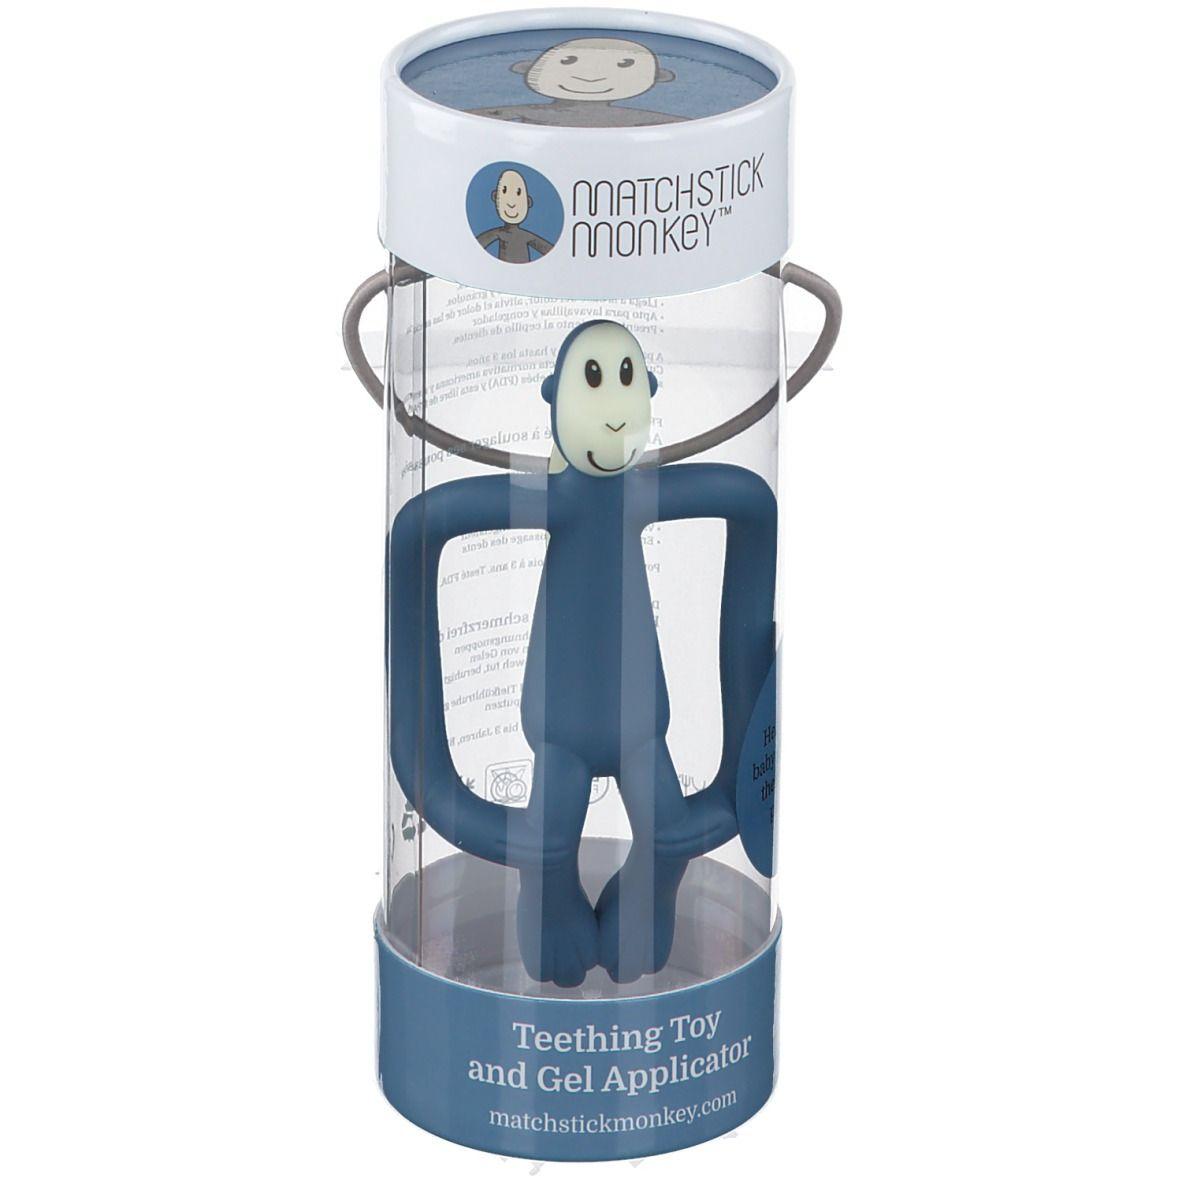 Matchstick Monkey Anneau de dentition Bleu ciel